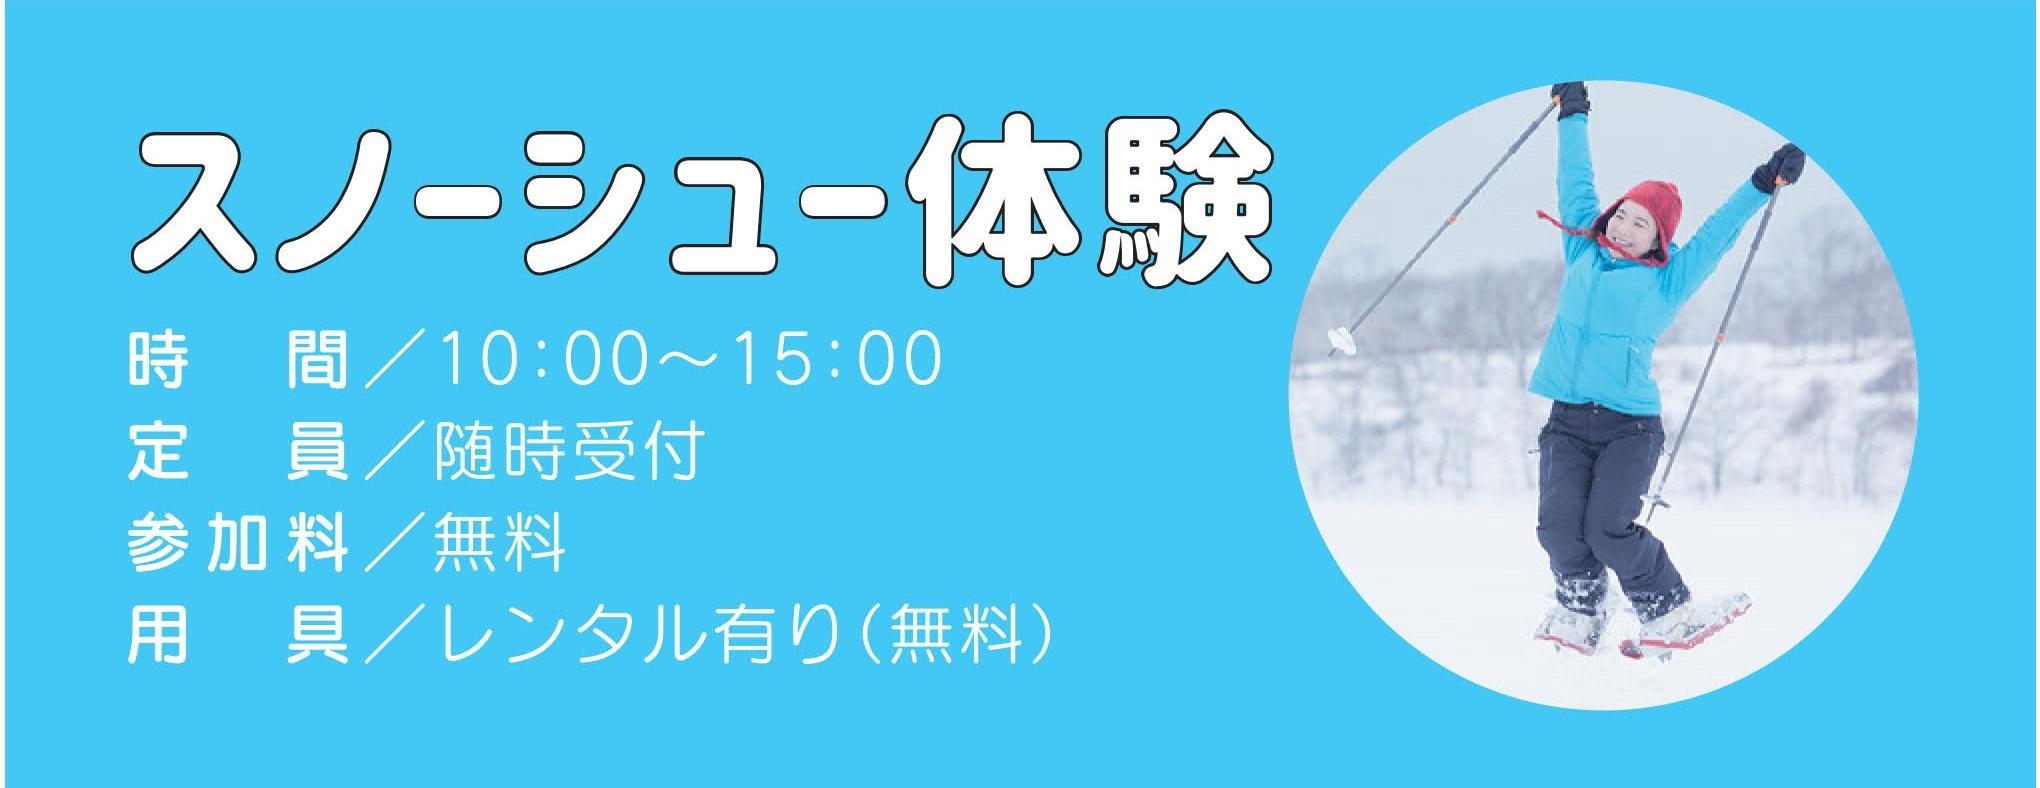 snowsports event2020-2.jpg